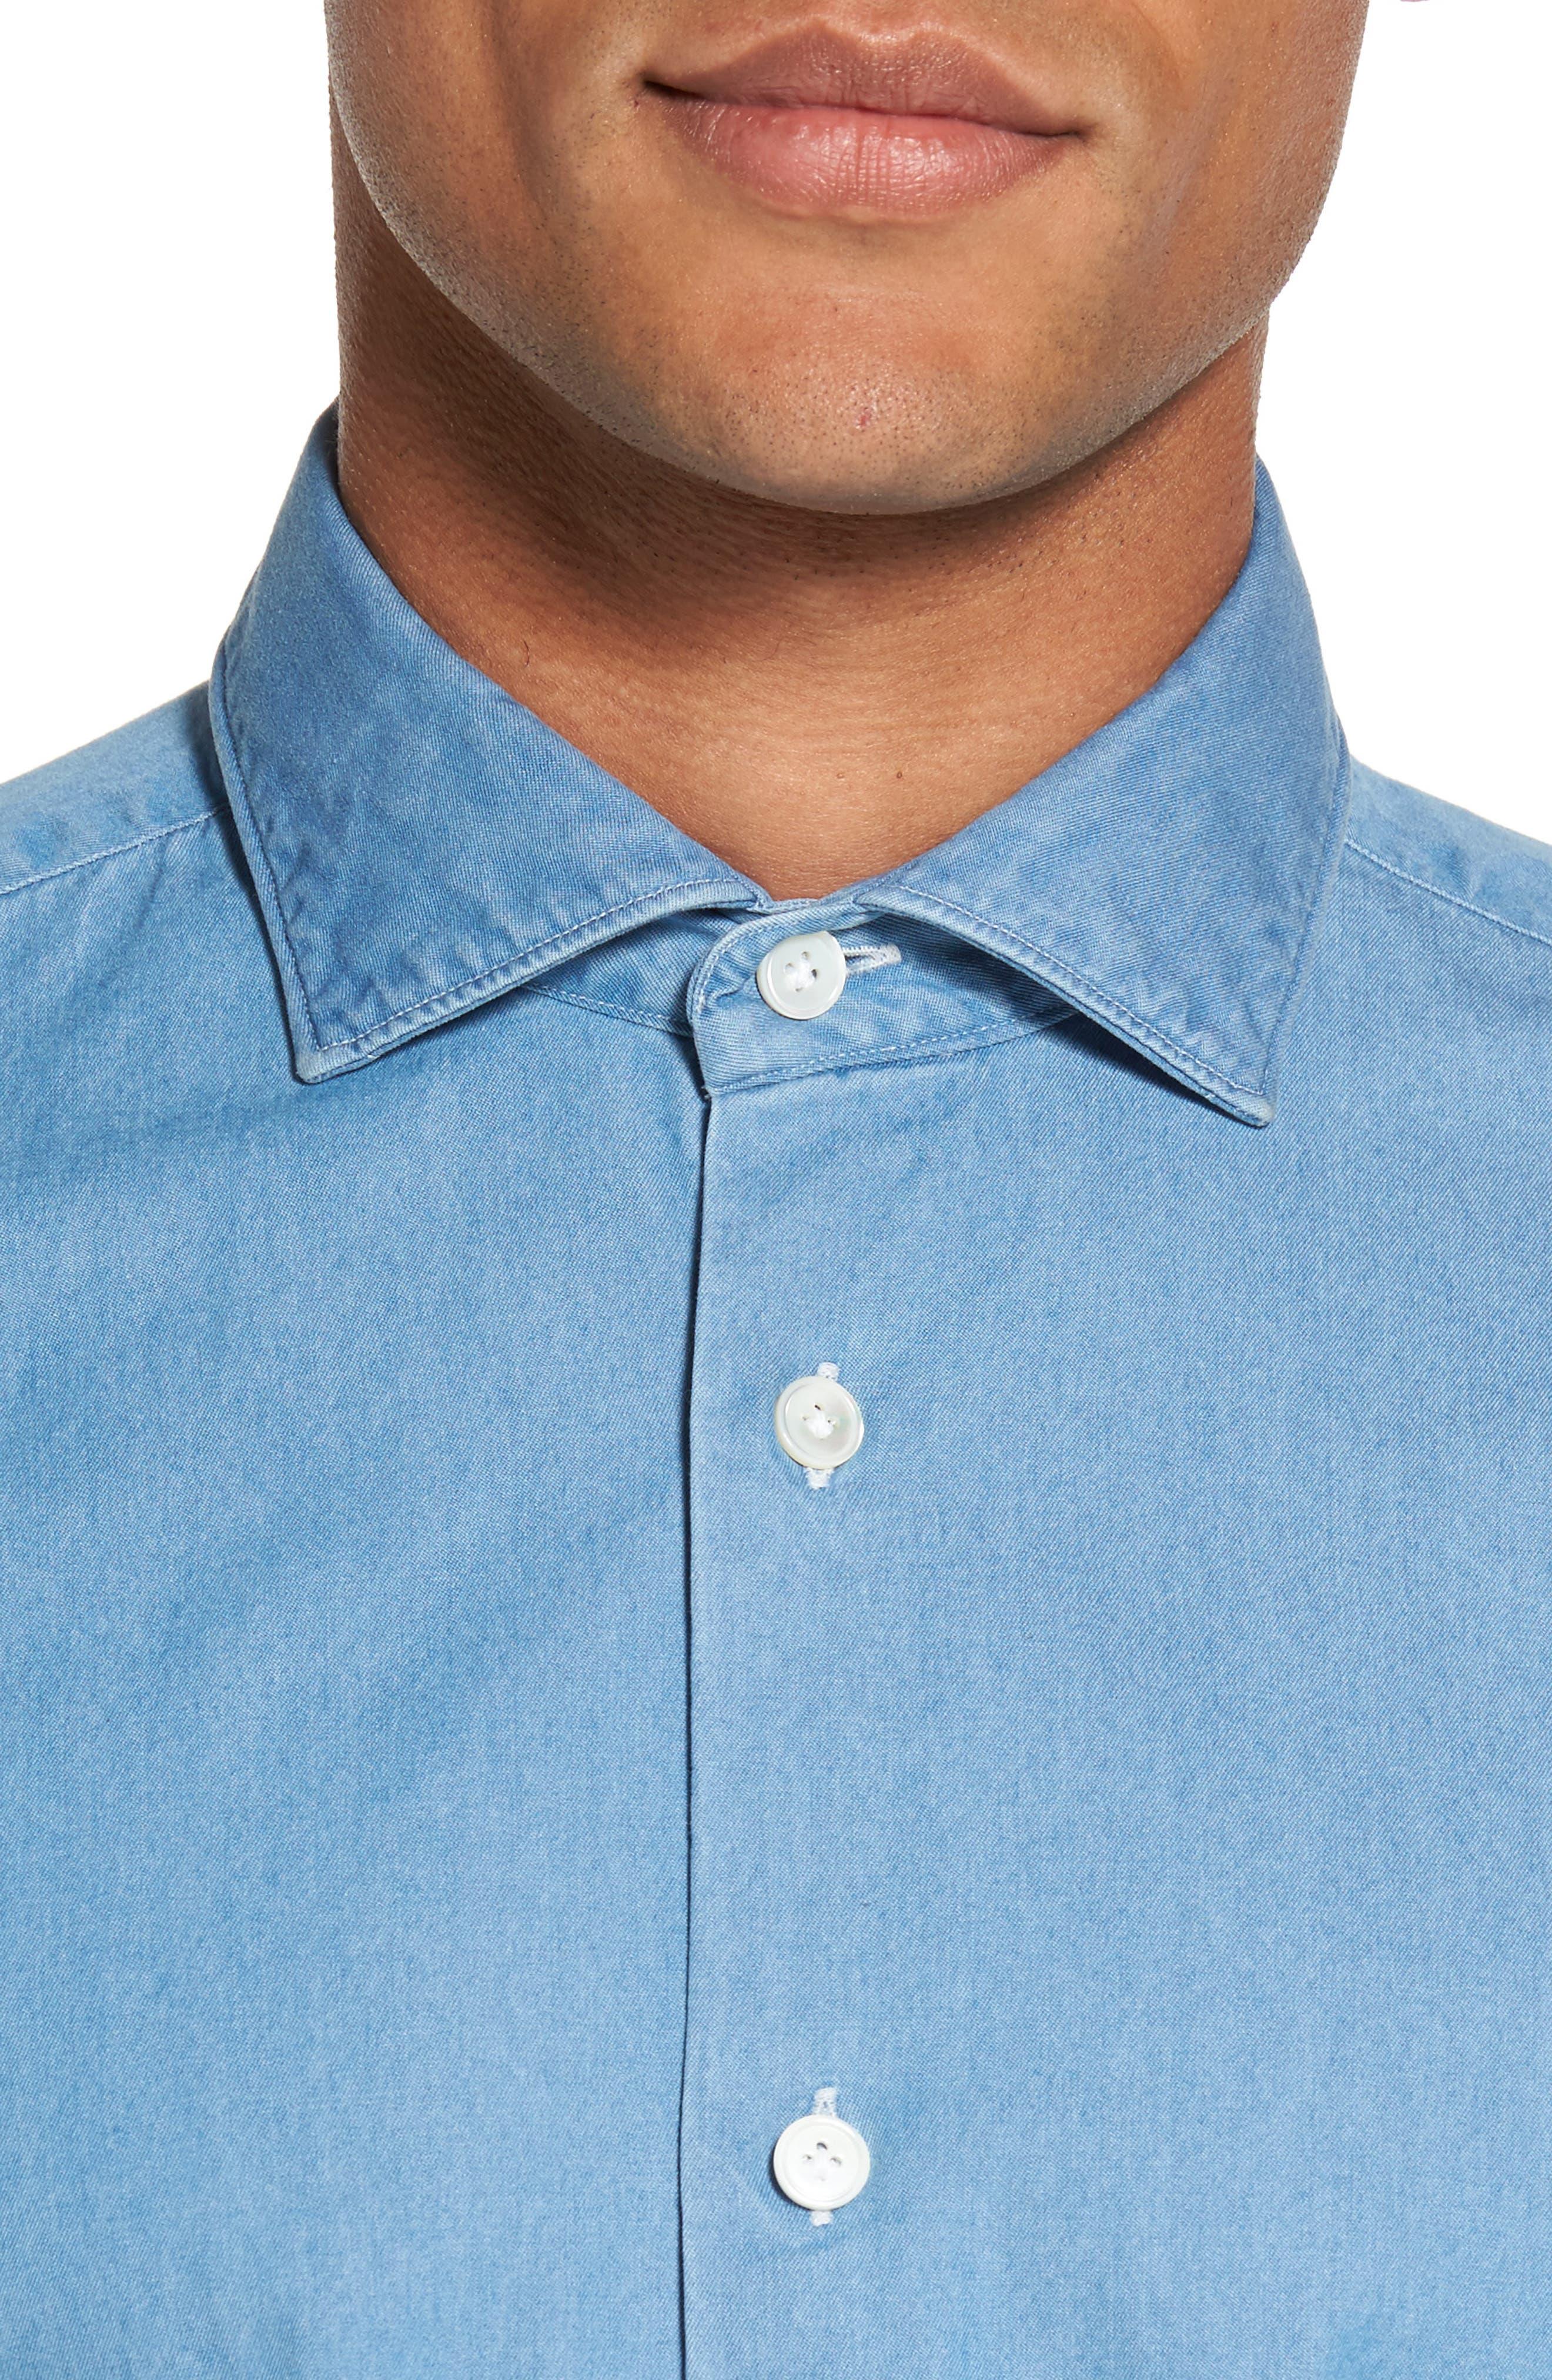 Denim Sport Shirt,                             Alternate thumbnail 4, color,                             402